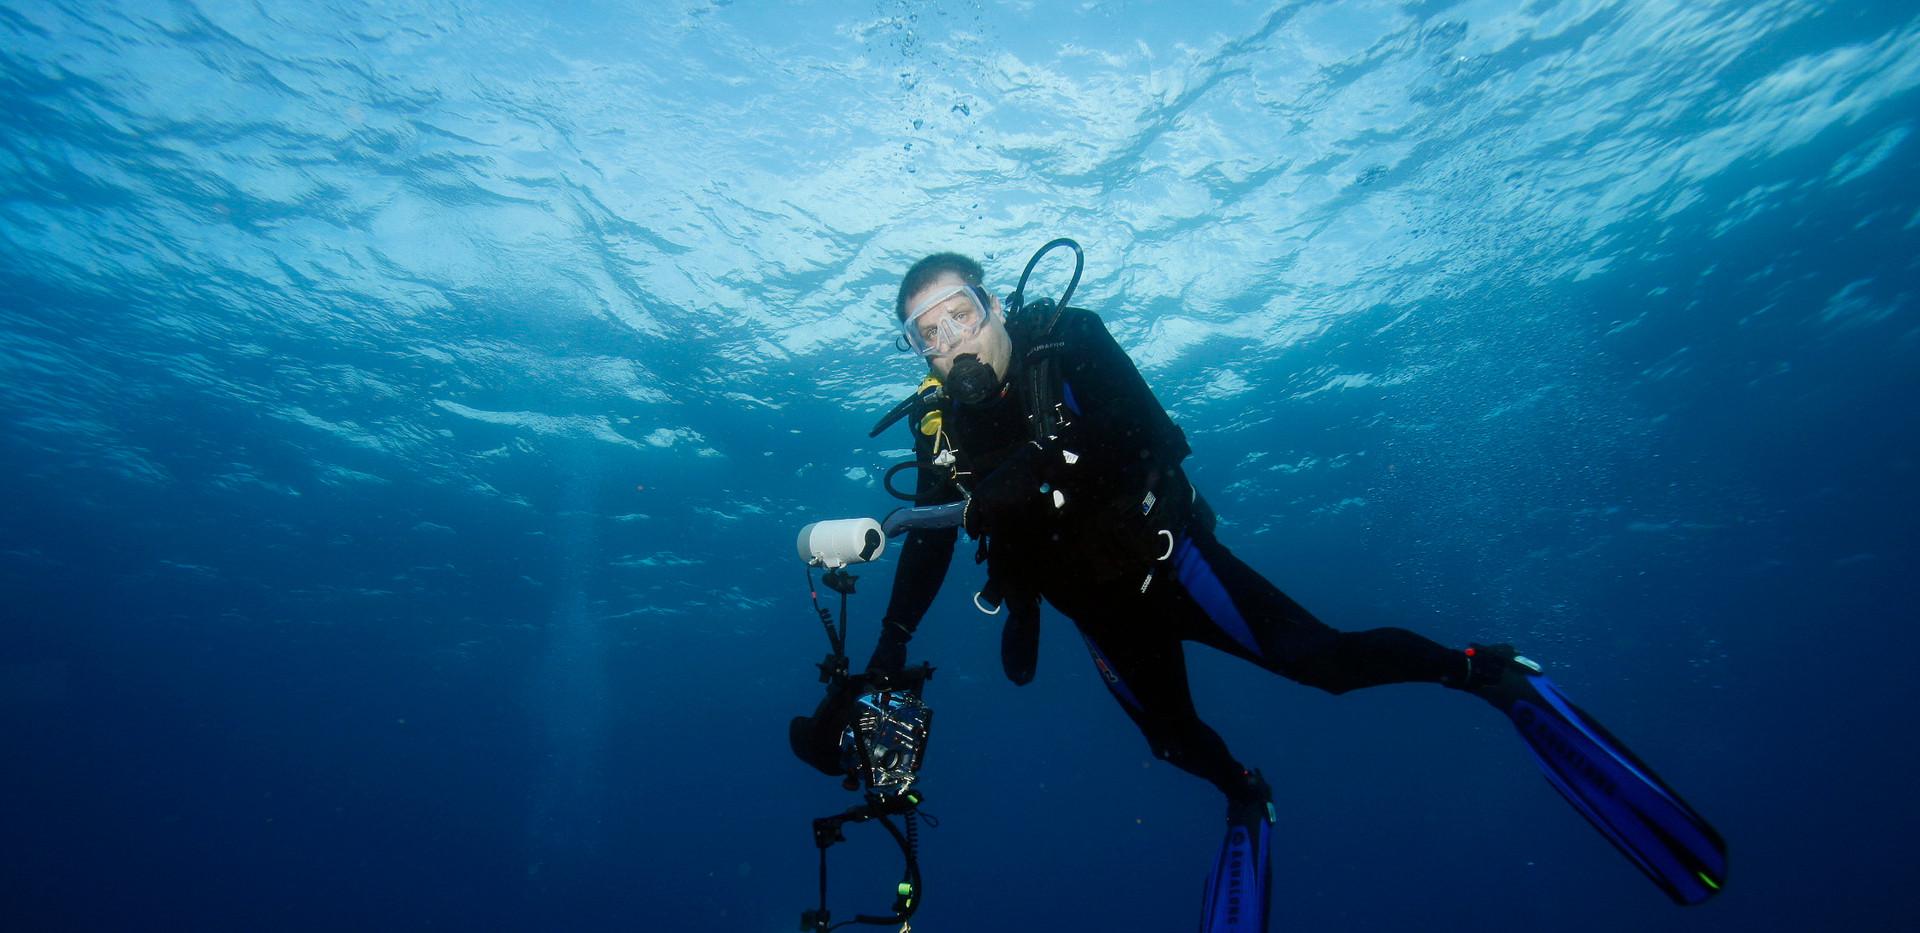 Matt McGee at Cocos Island